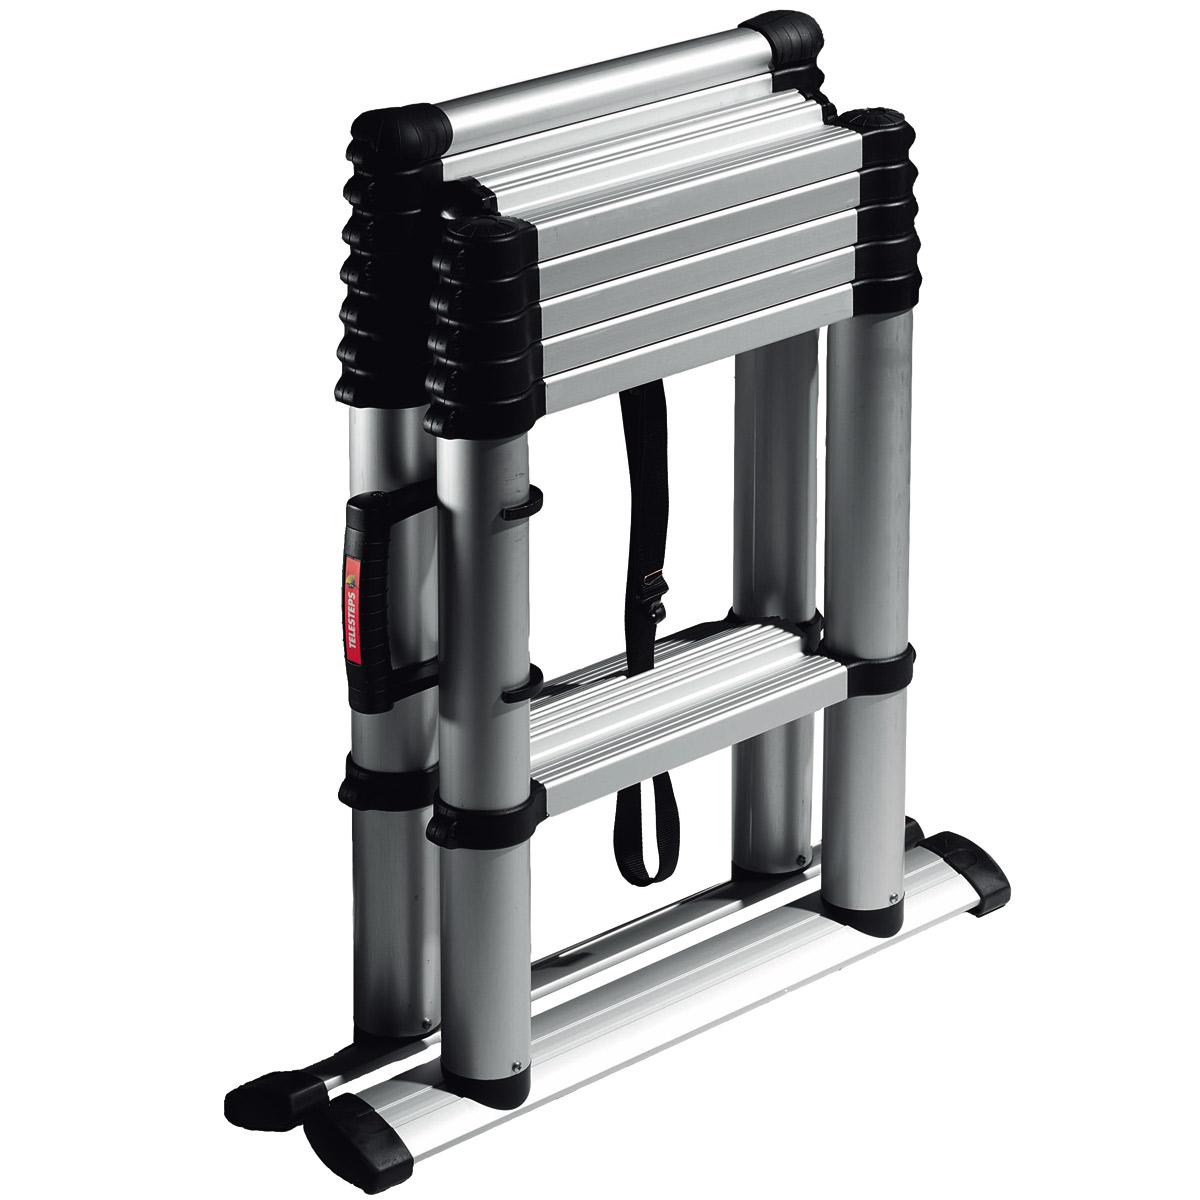 Telesteps Telescoping Ladder : Telescopic ladders telesteps combi aluminium